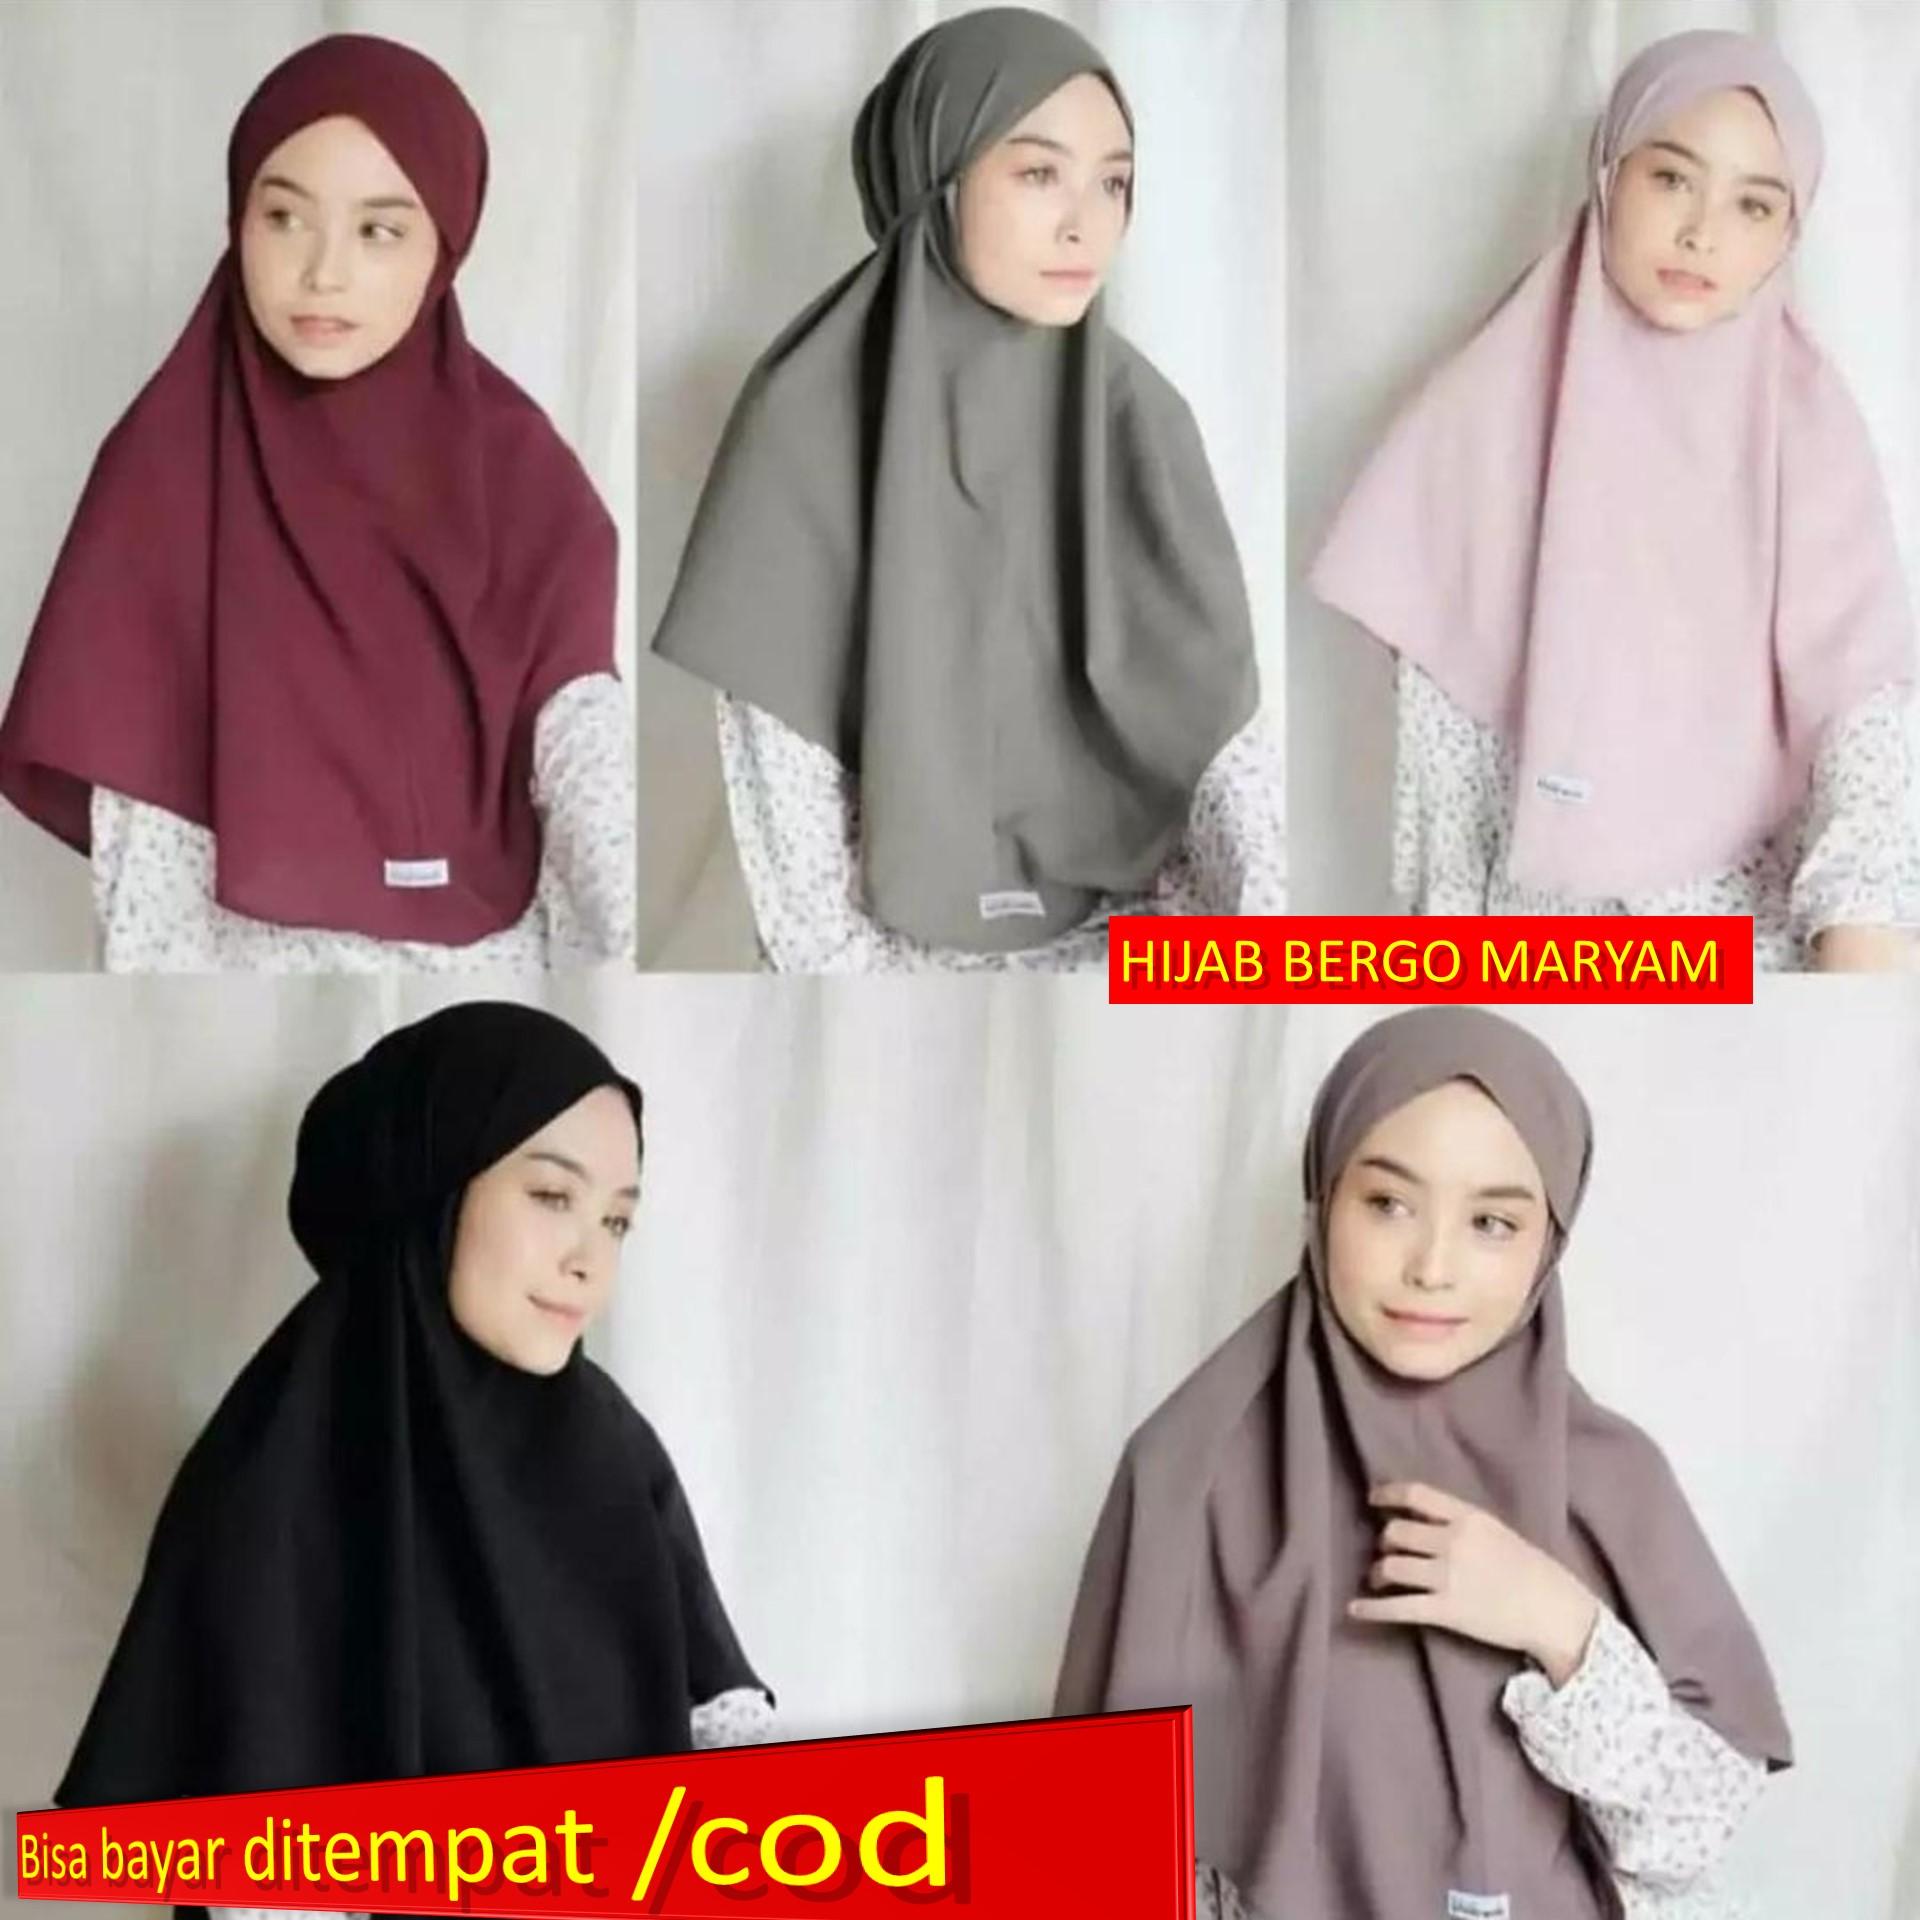 Hijab Bergo Maryam Hijab Cantik Hijab Santai Hijb Terlaris Hijab Terbaru Hijab Terlaris Hijab Cantik Hijab Rumahan Lazada Indonesia